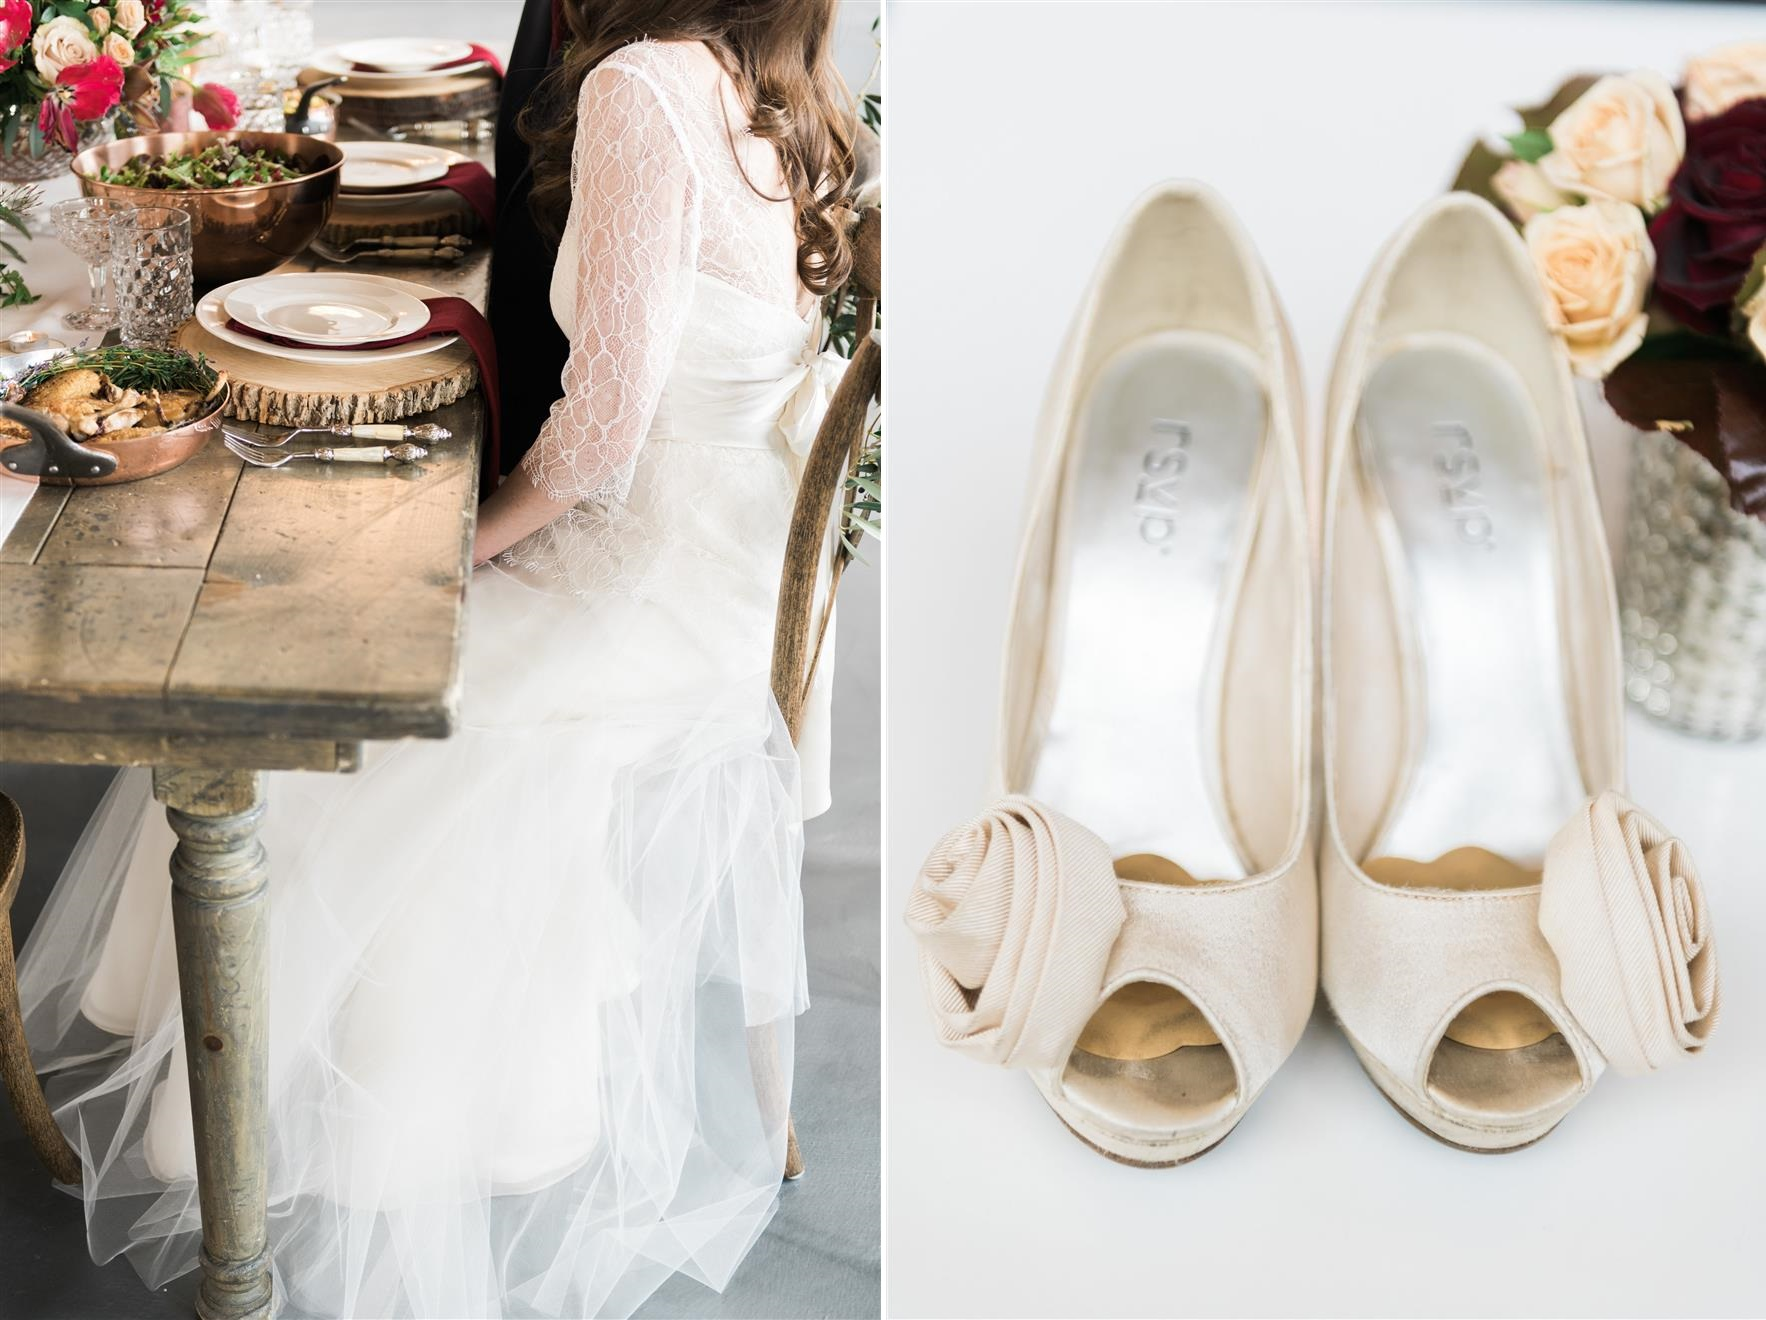 A Stunning Marsala Wedding Inspiration Shoot from The Photography Stylistas